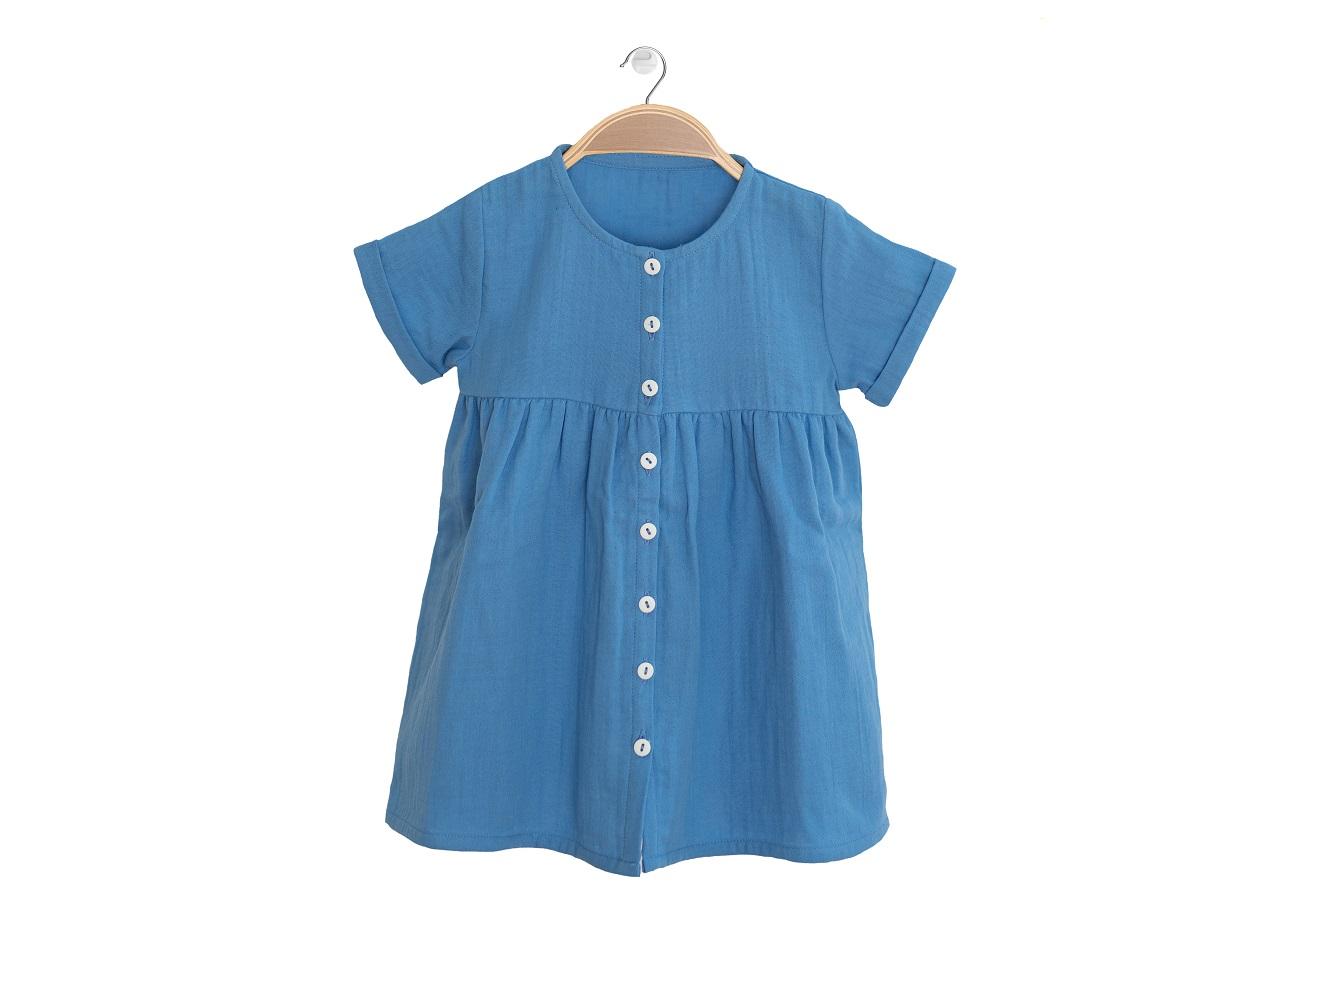 Harmony Dress - 12 Months